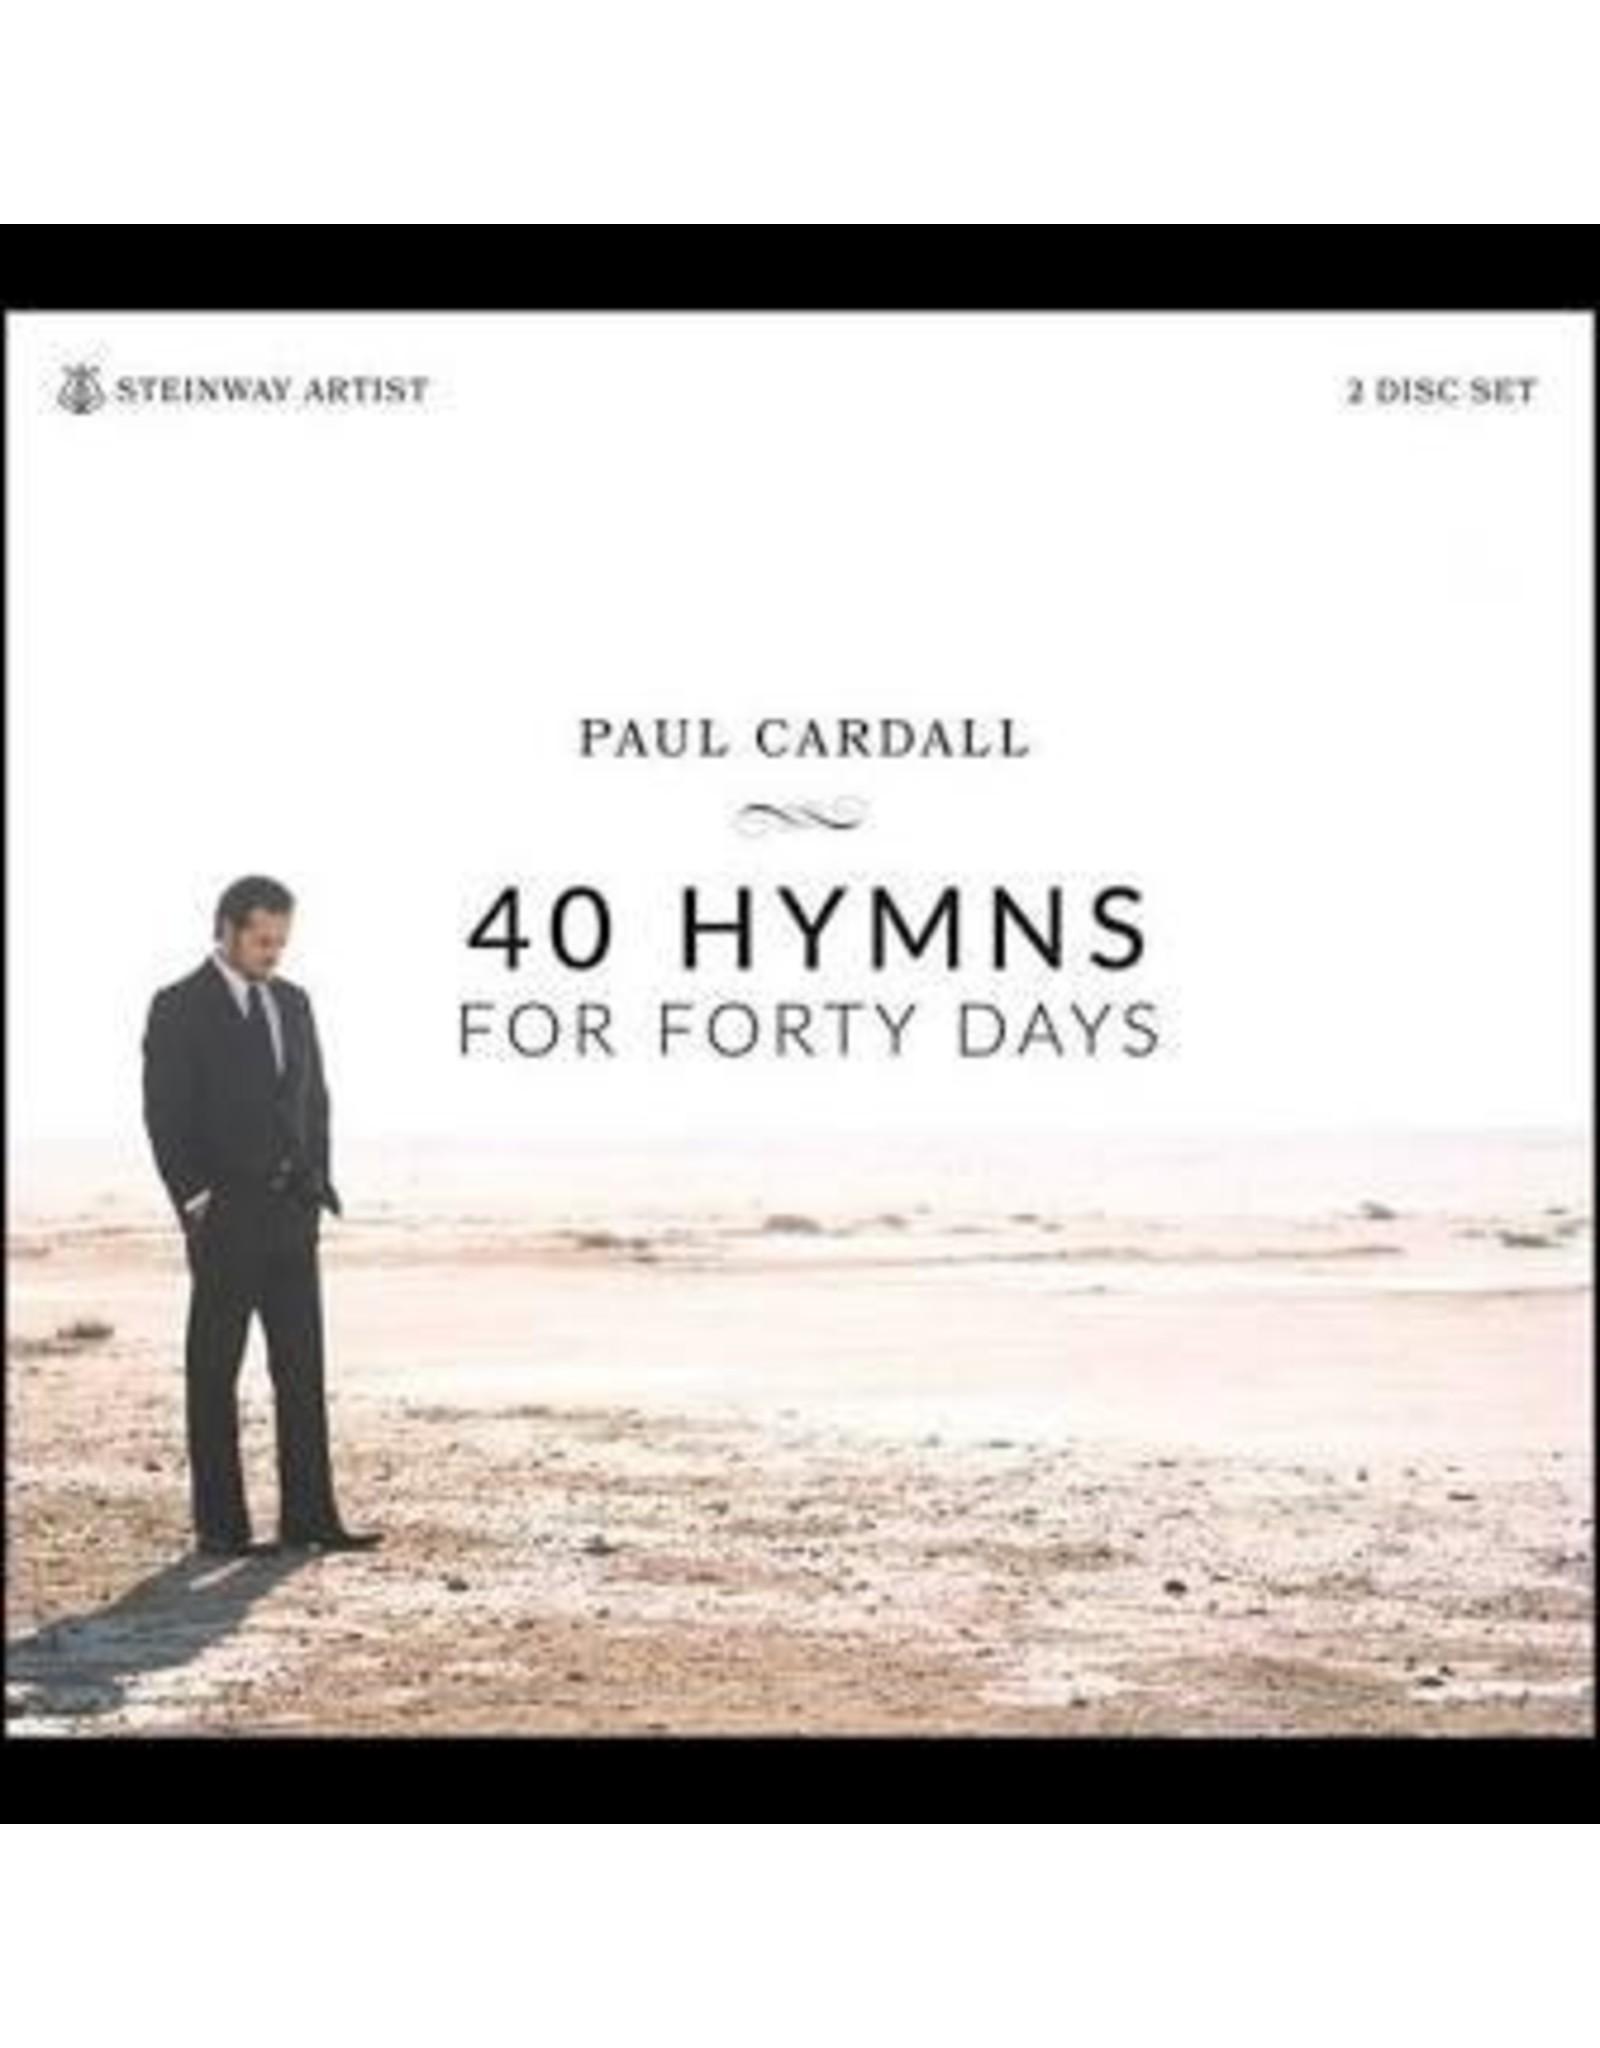 Soundburst Audio 40 Hymns For 40 Days by Paul Cardall CD